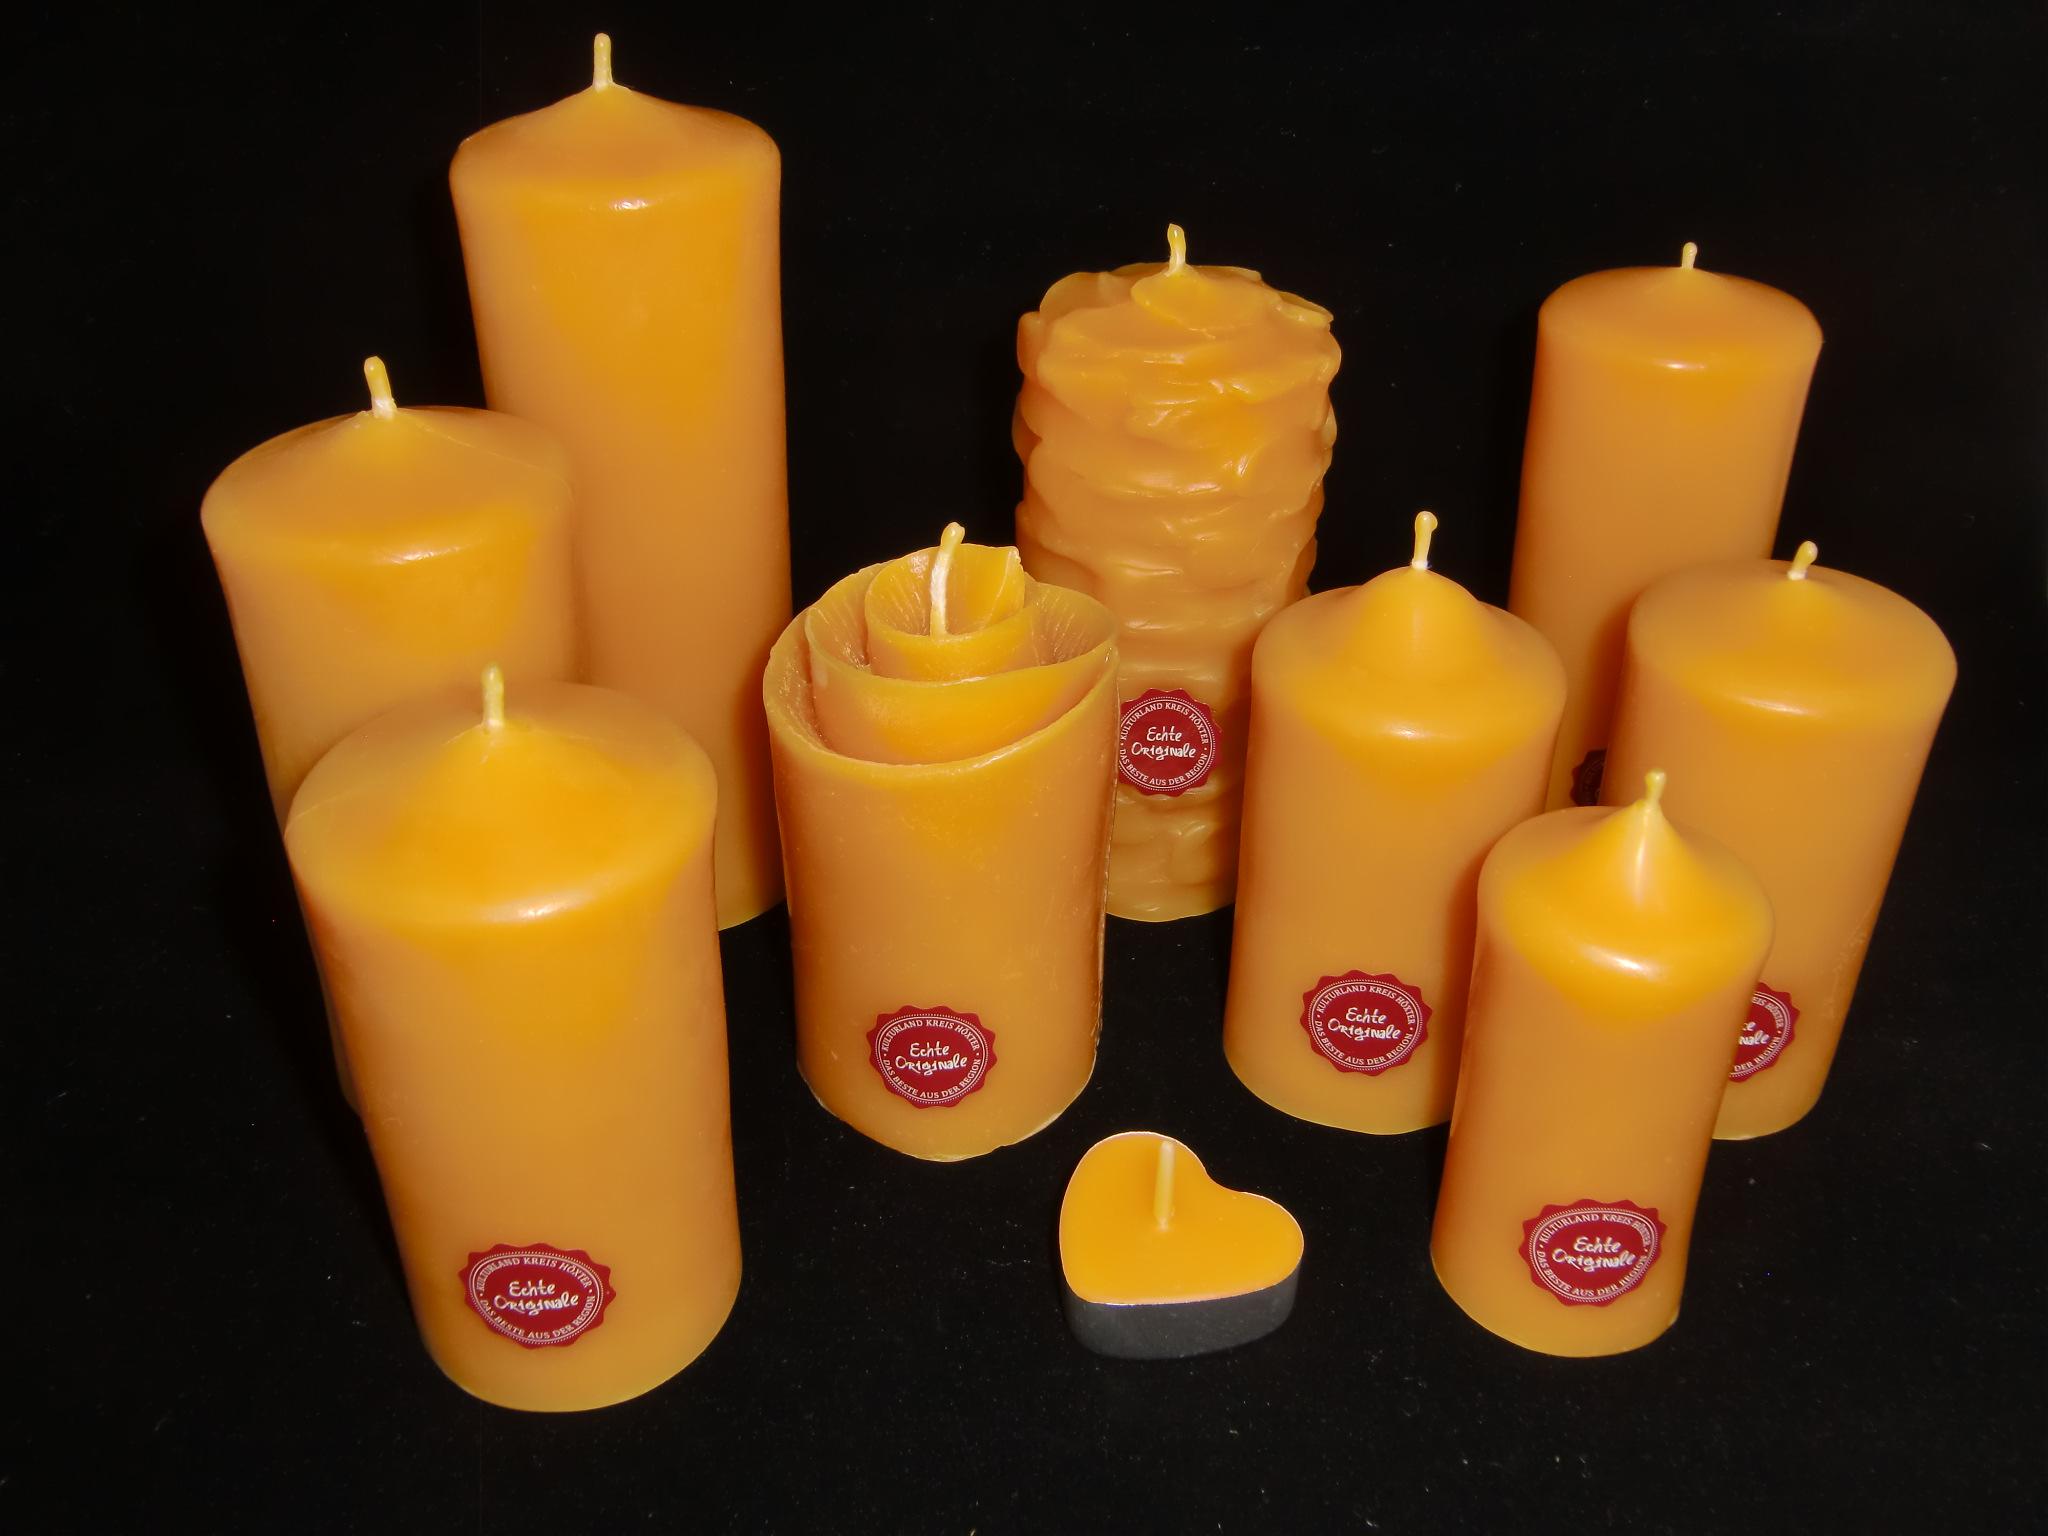 Deko-Kerzen & -Teelichter Bienenwachskerze Bienenstock 6,5 cm x 7 cm aus reinen Bienenwachs  170g Innenraum-Dekorationen